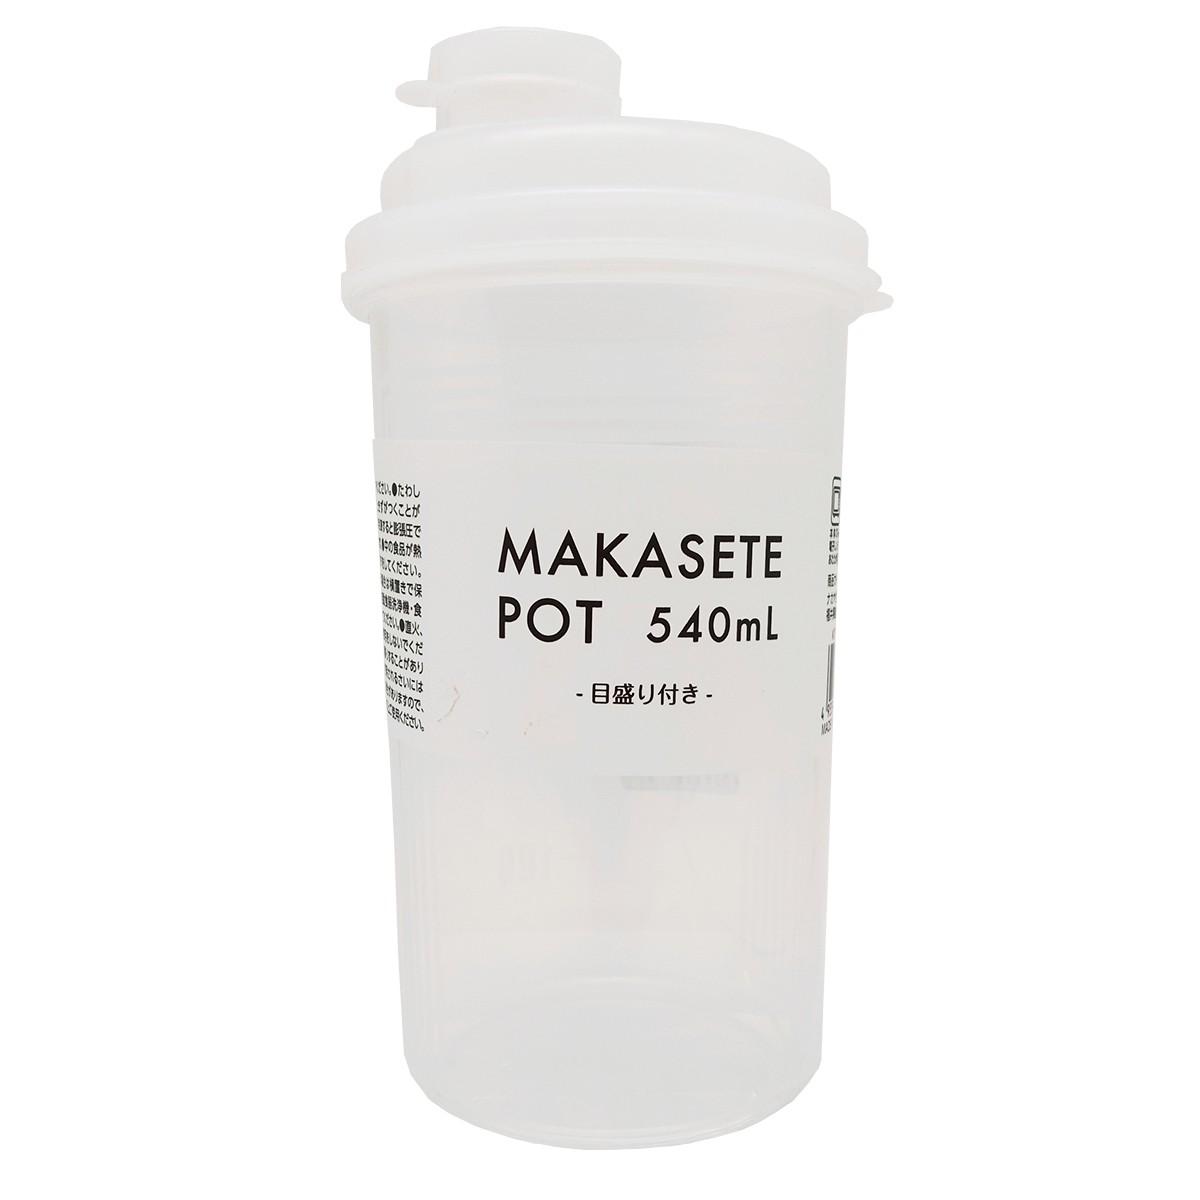 Pote Plástico Redondo Makasete 540mL - Nakaya